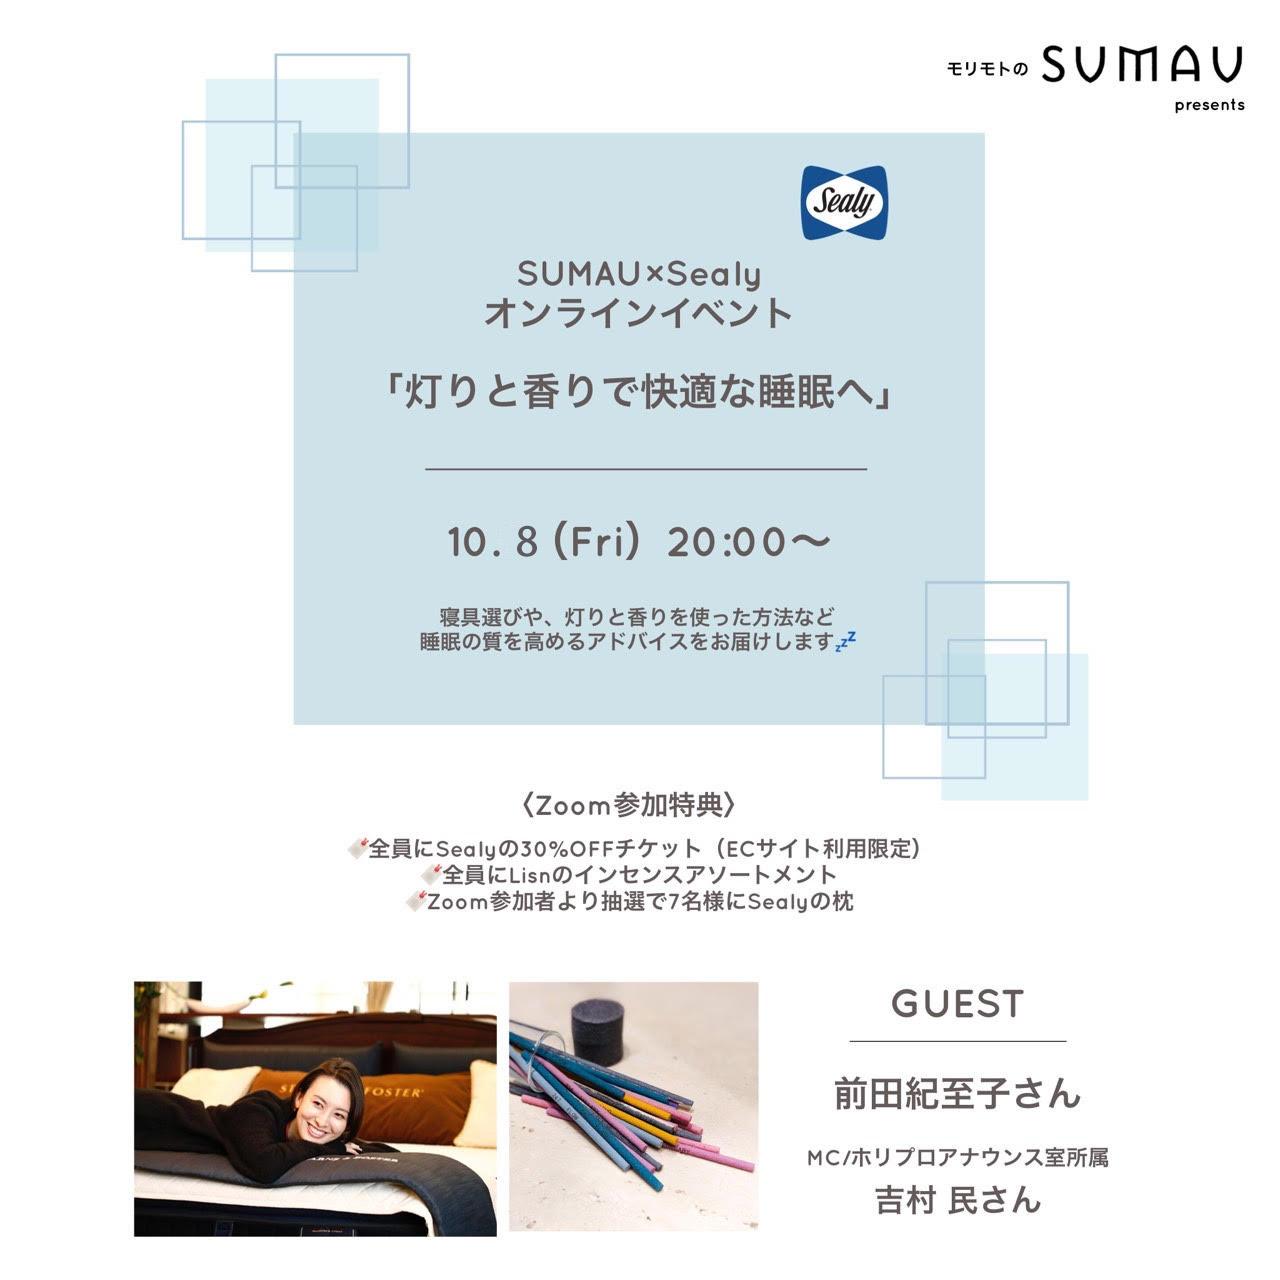 SUMAU×Sealy